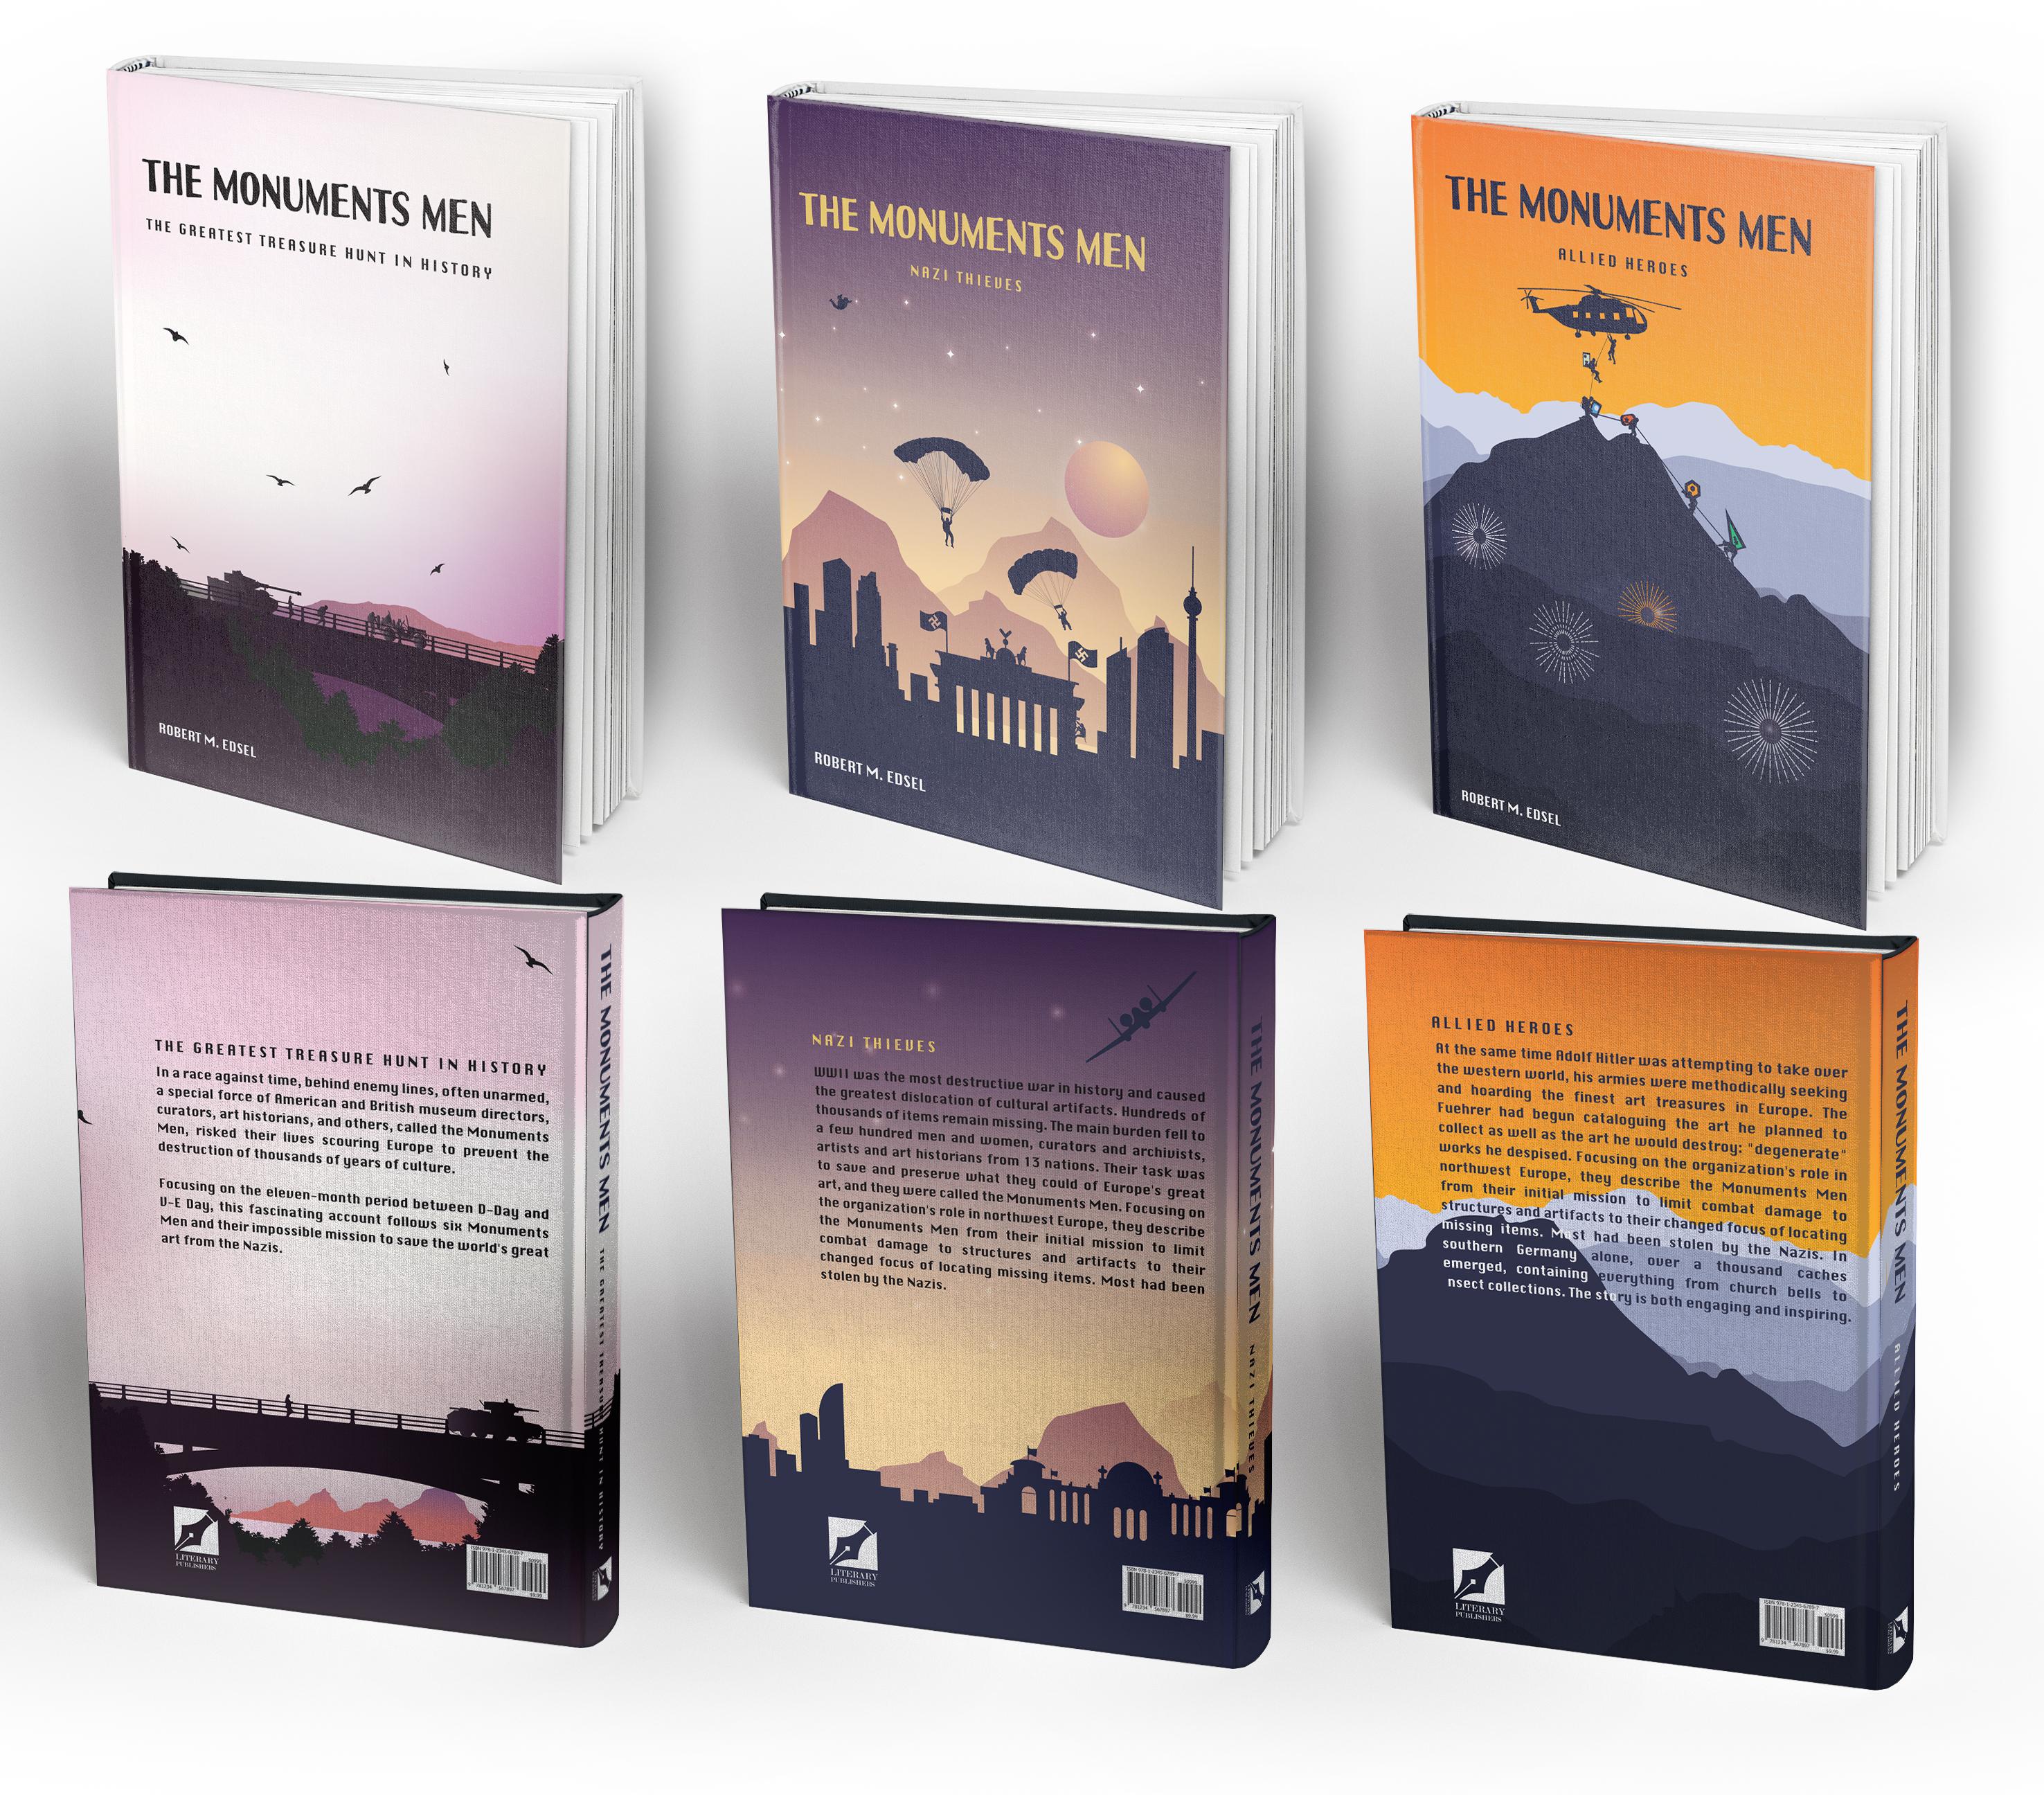 The Monuments Men (Trilogy) – Book cover Design